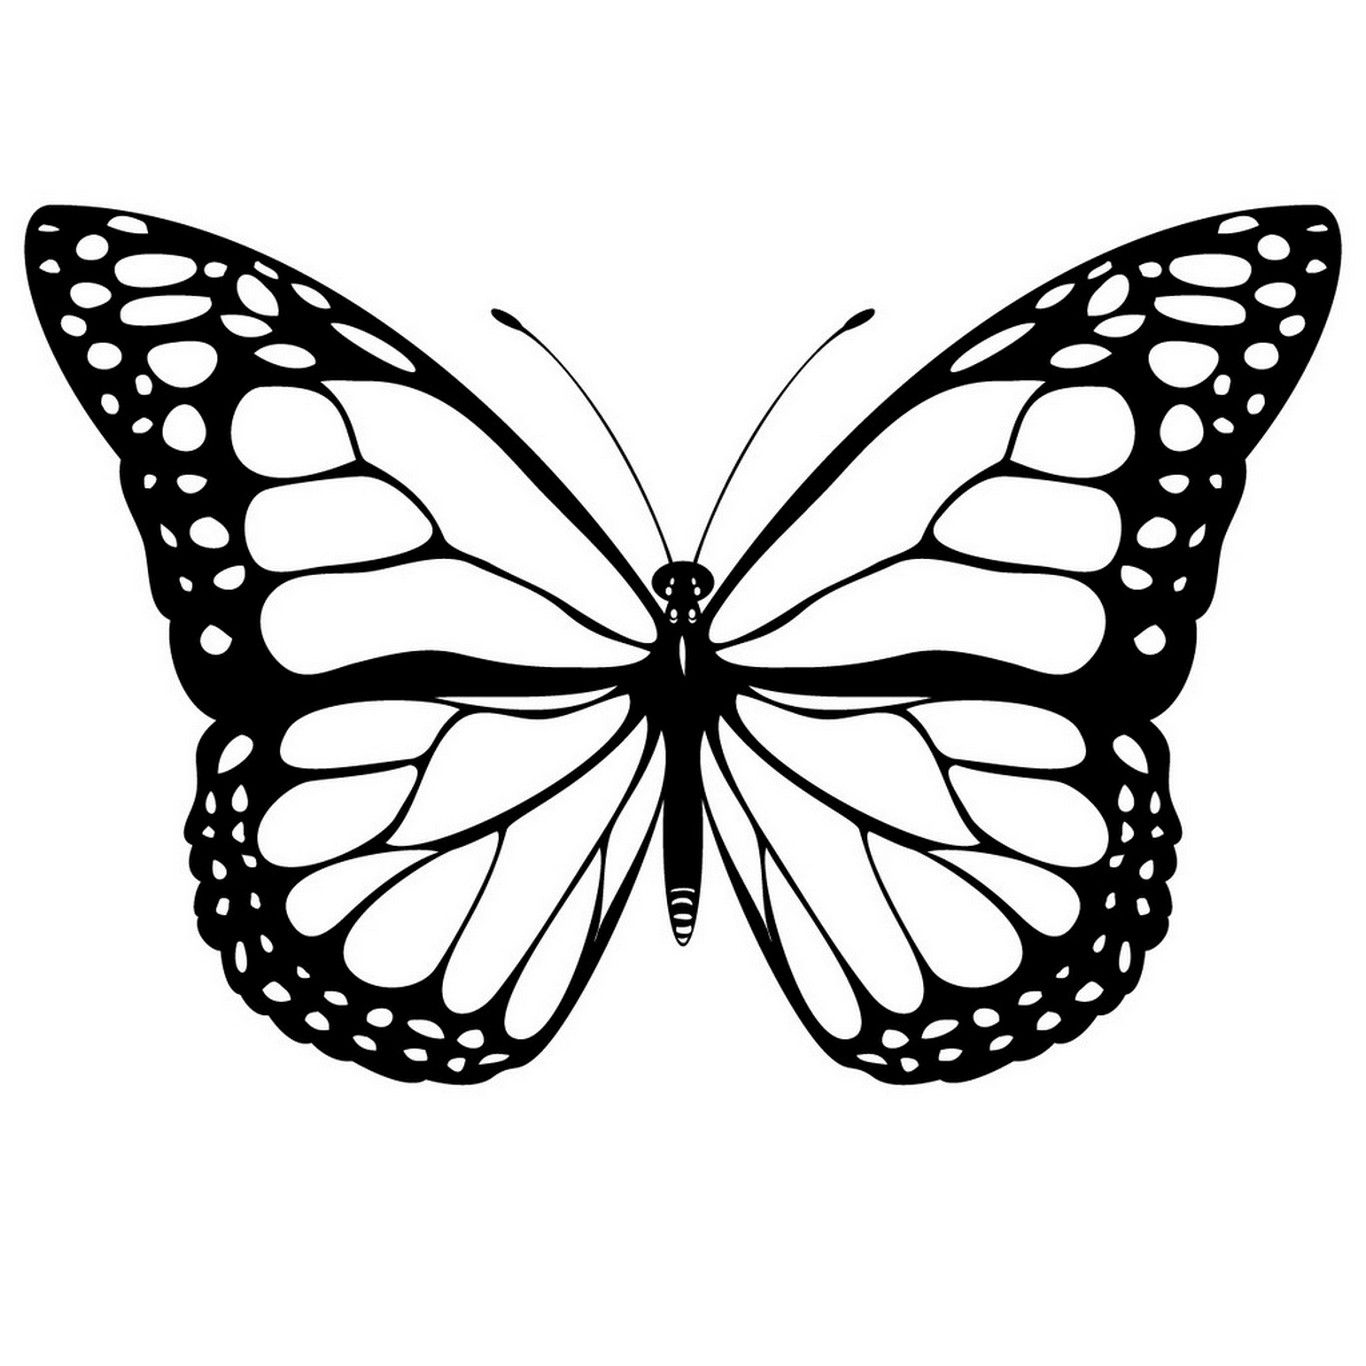 Butterfly Shape Coloring Page Vlinder Kleurplaten Jpg 1366 1366 Impressao De Borboleta Desenhos Para Colorir Borboletas Tatuagem De Borboleta